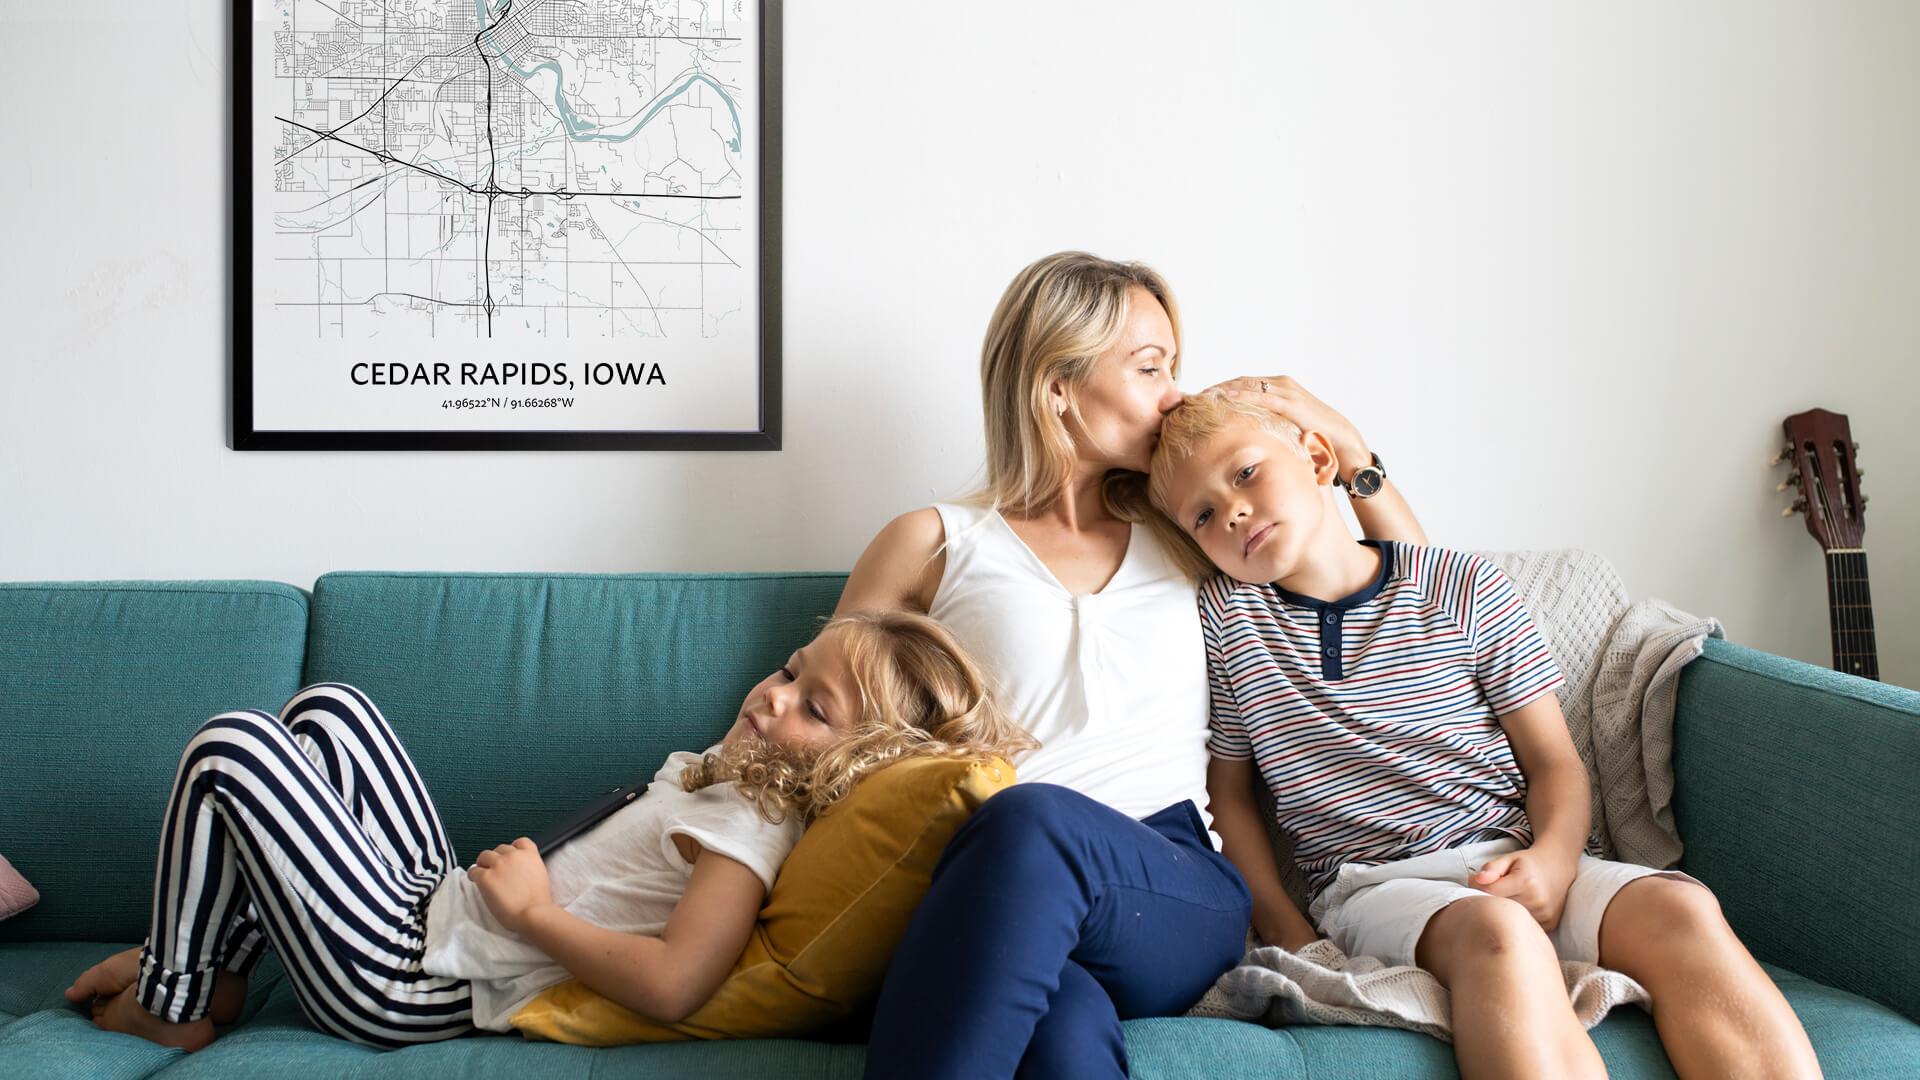 Cedar Rapids map poster